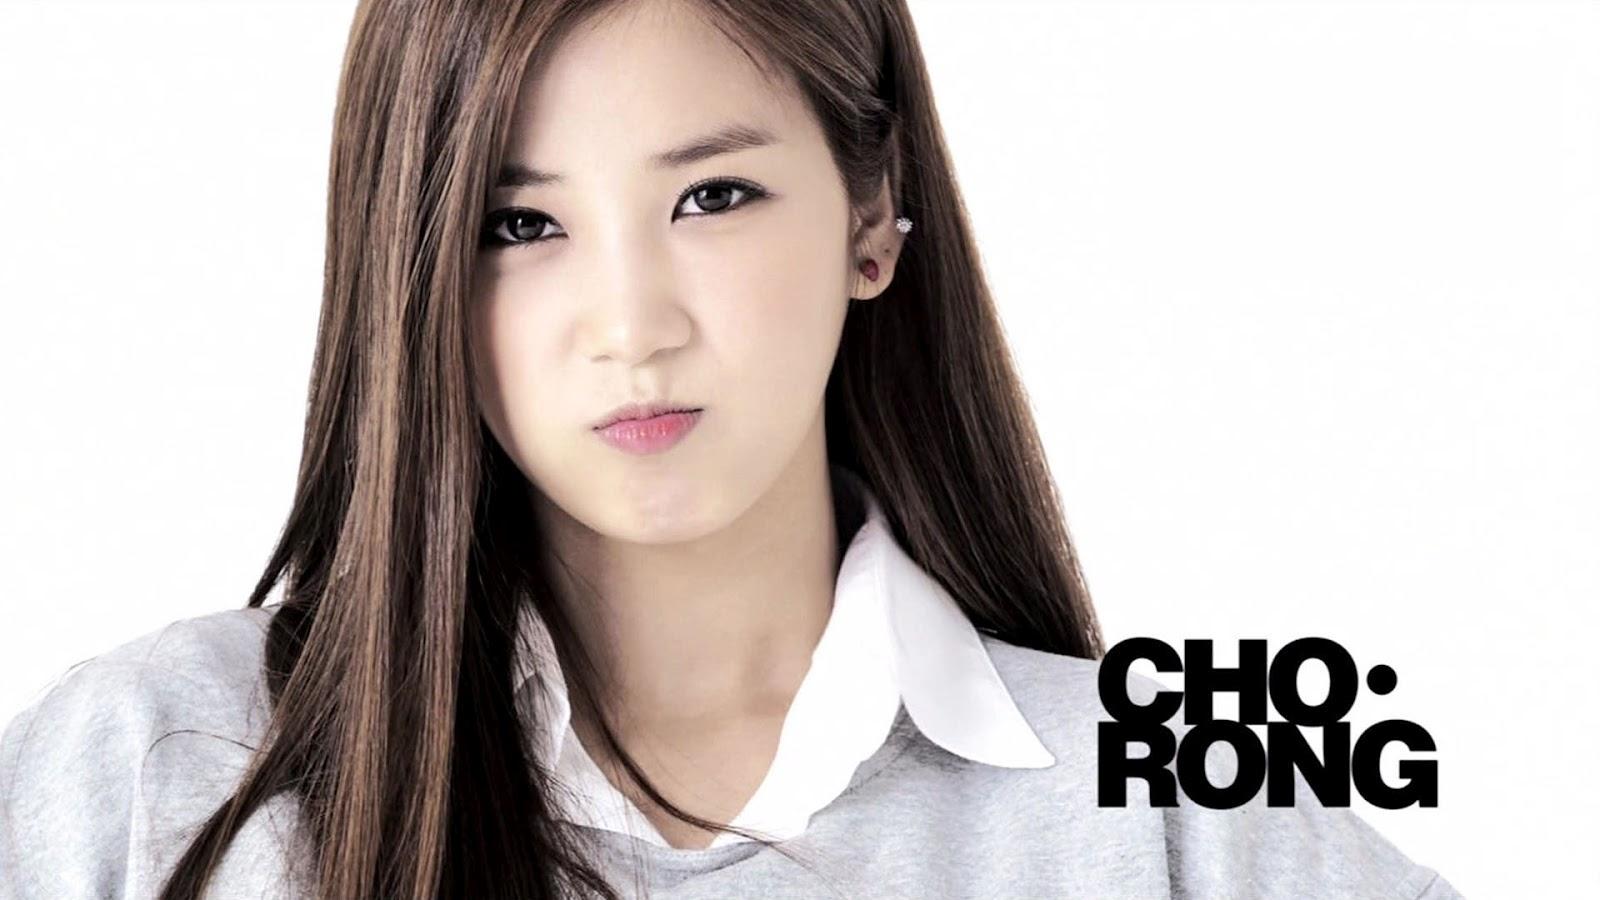 Chorong is a HD Wallpaper